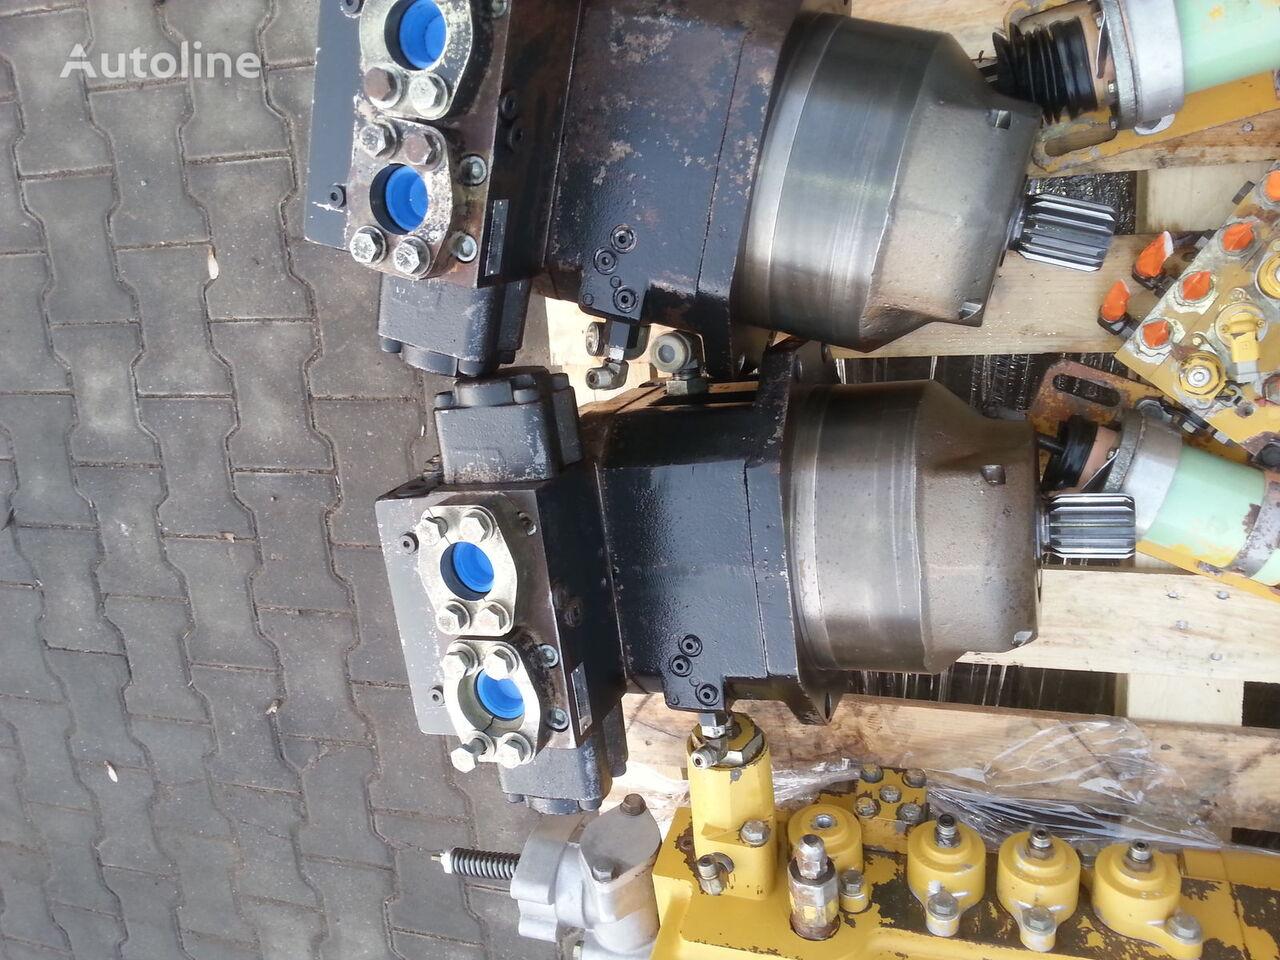 CATERPILLAR 345 B AA4VSE hidraulički motor za bagera